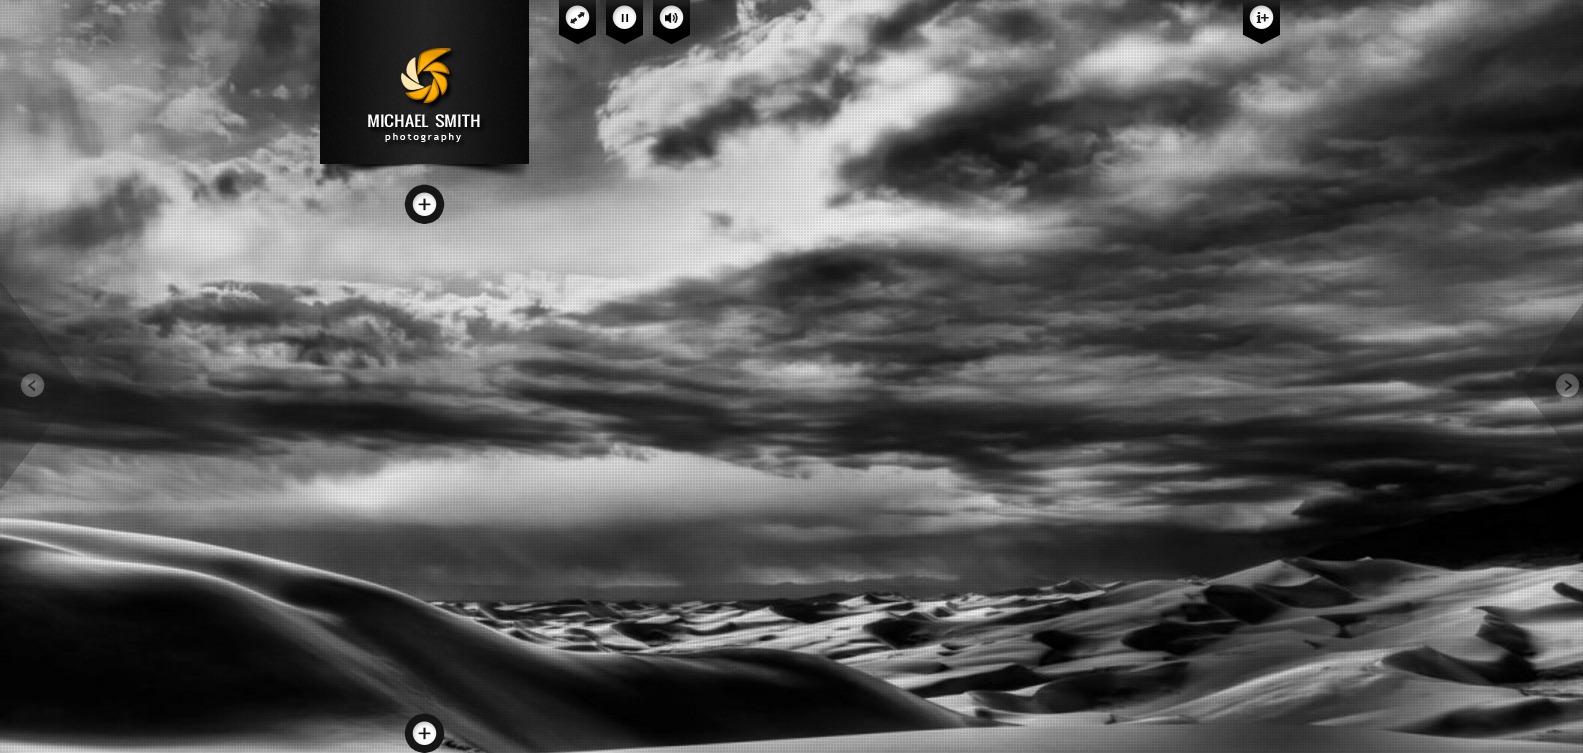 15 Best HTML Photography Website Templates for 2017 | Code Geekz